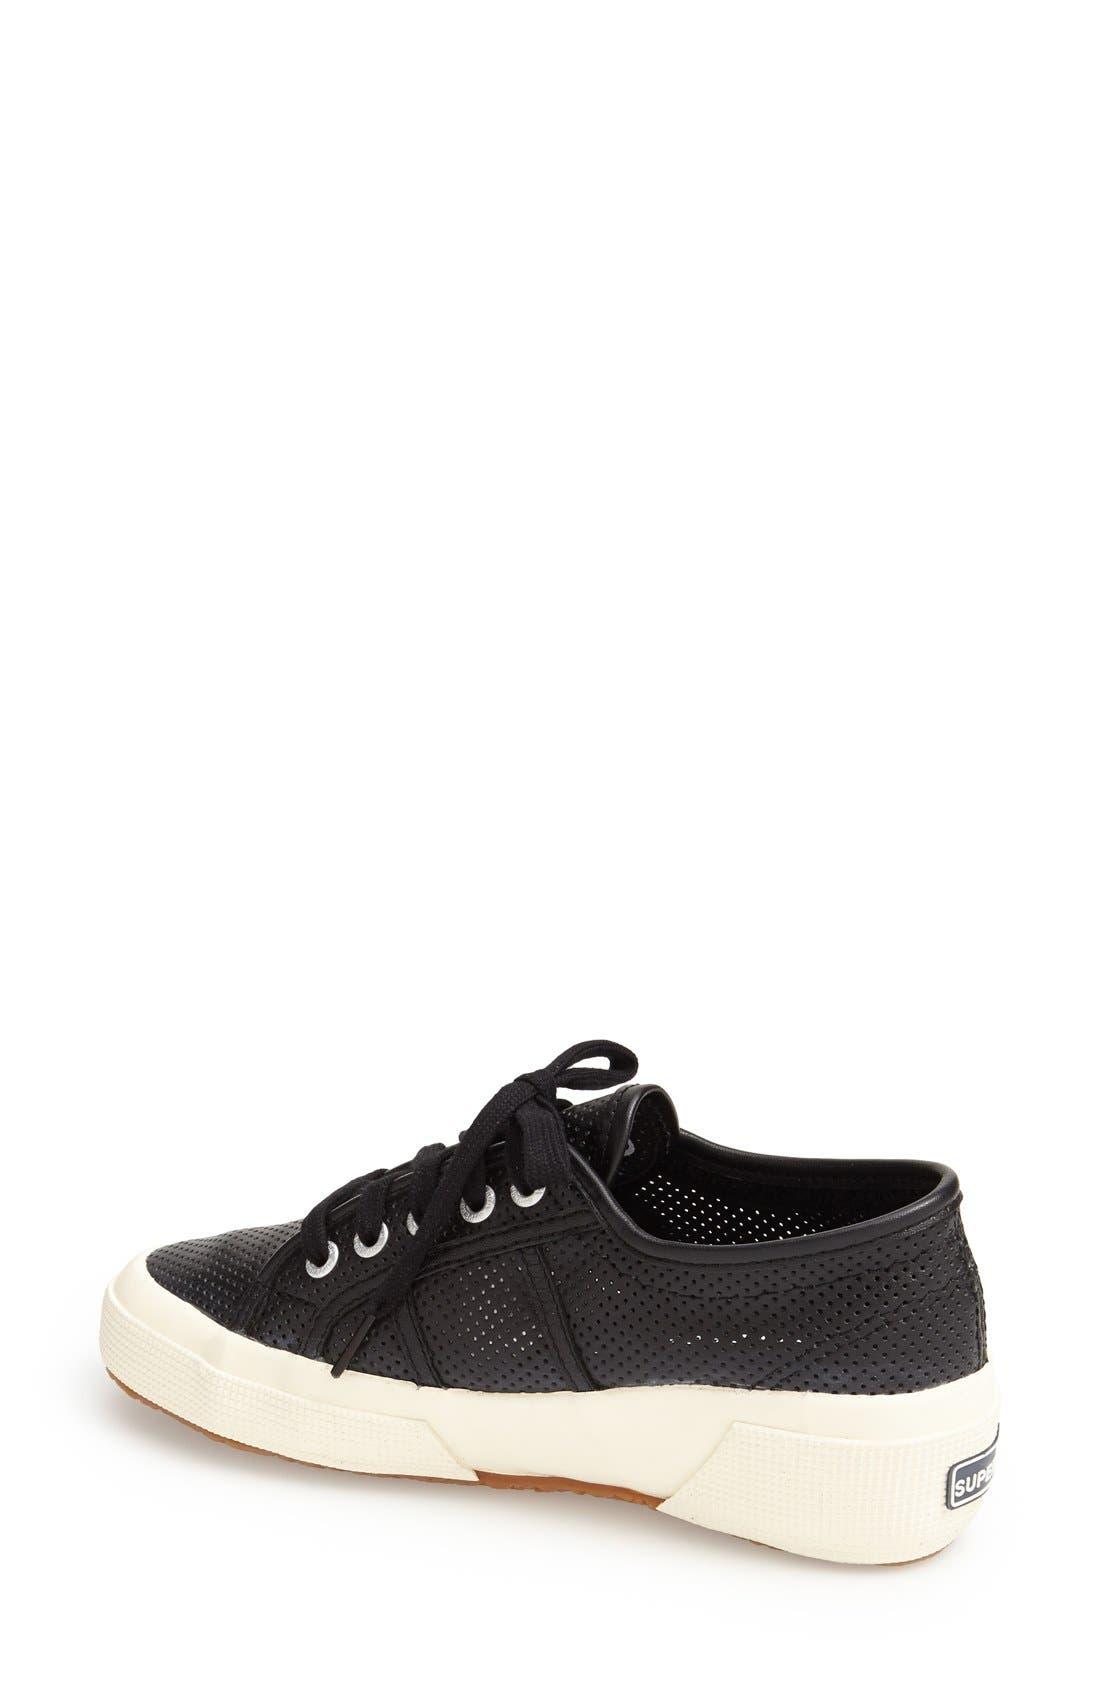 Alternate Image 2  - Superga 'Perforated Cotu' Leather Sneaker (Women)